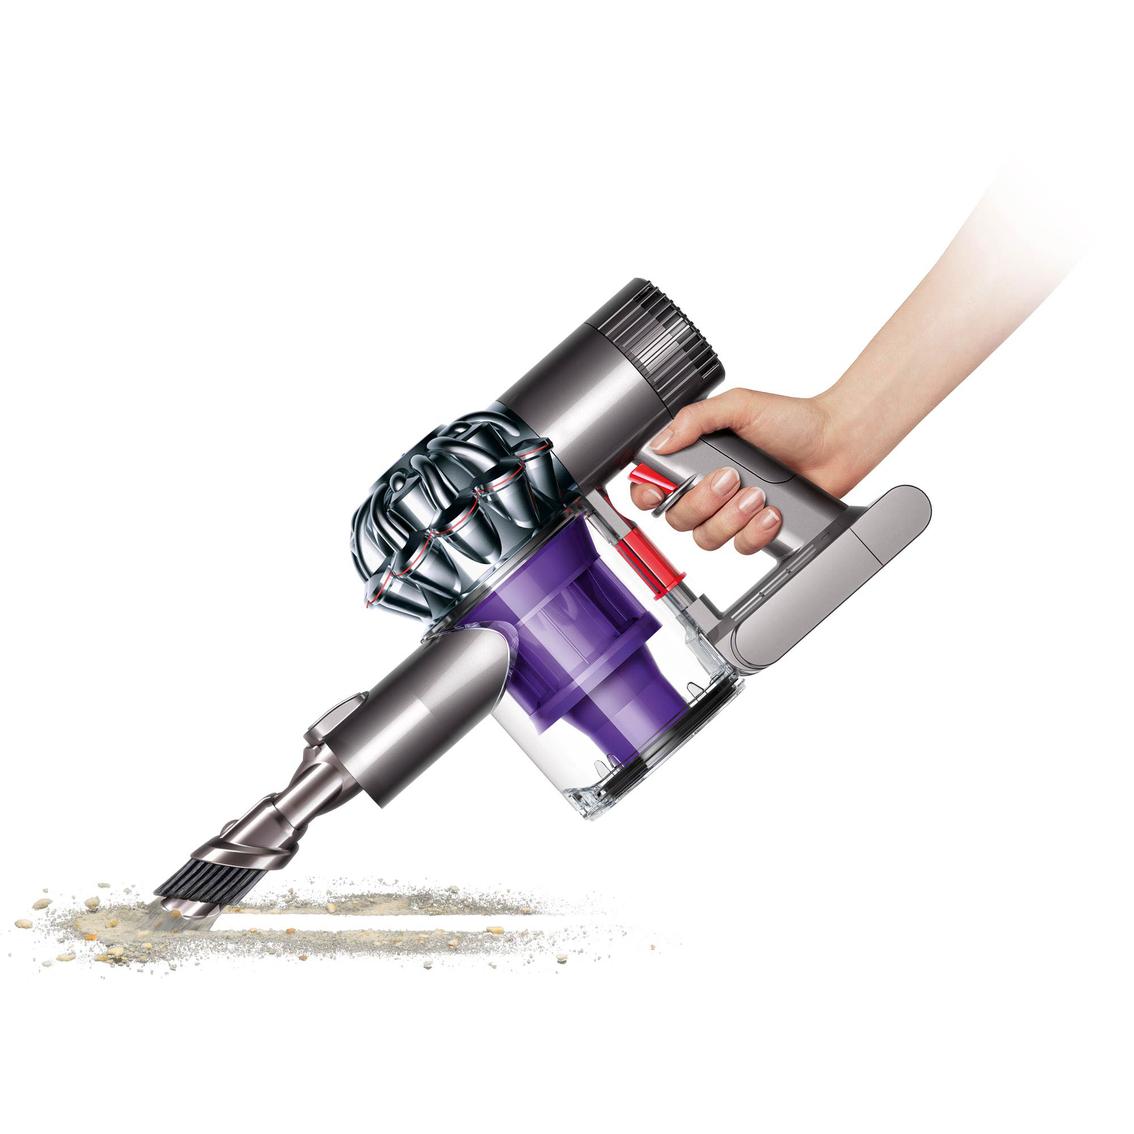 Captivating Dyson DC58 Handheld Vacuum